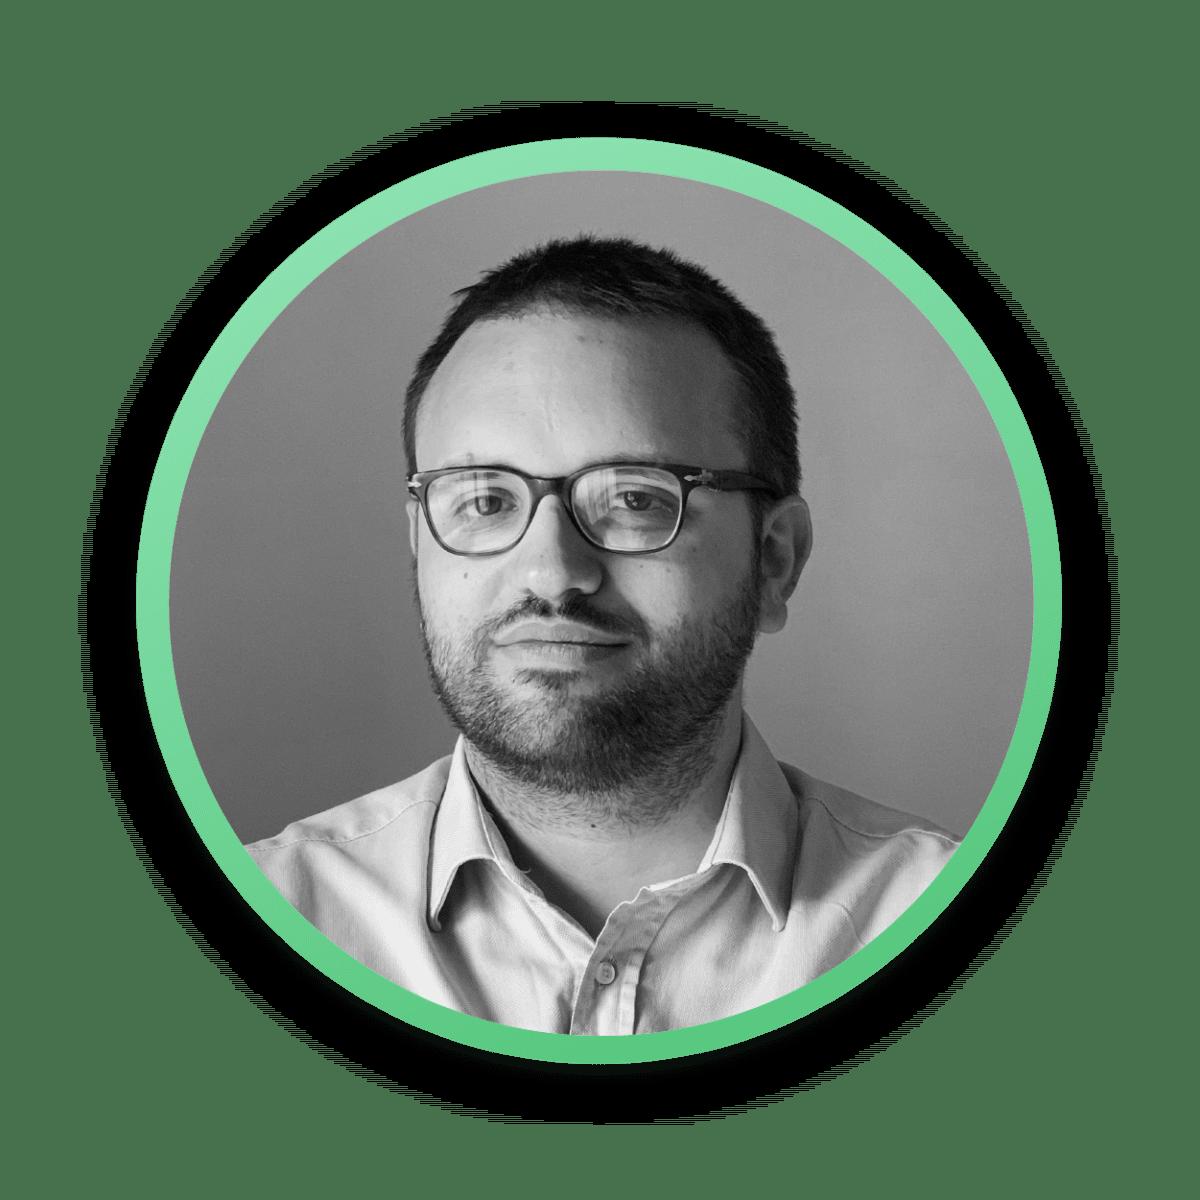 davide_speaker